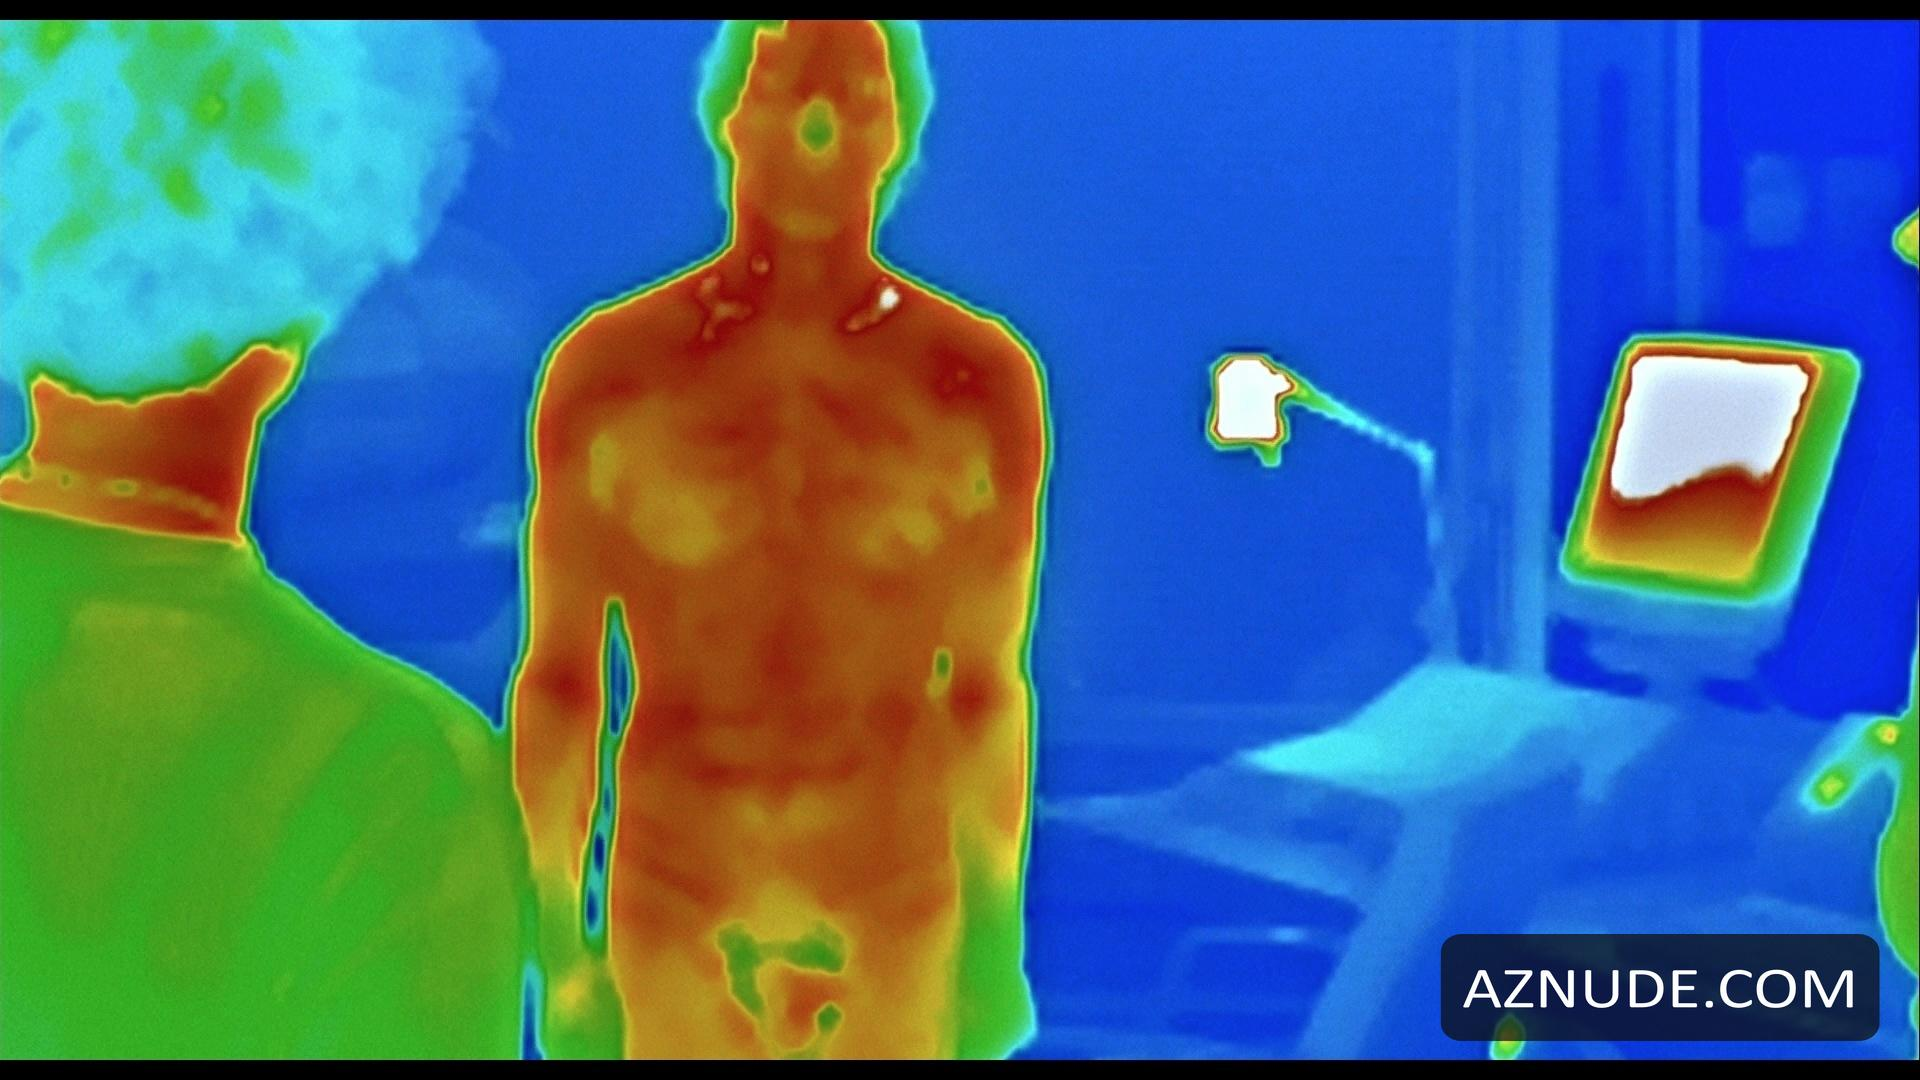 Kevin Bacon Nude Scene